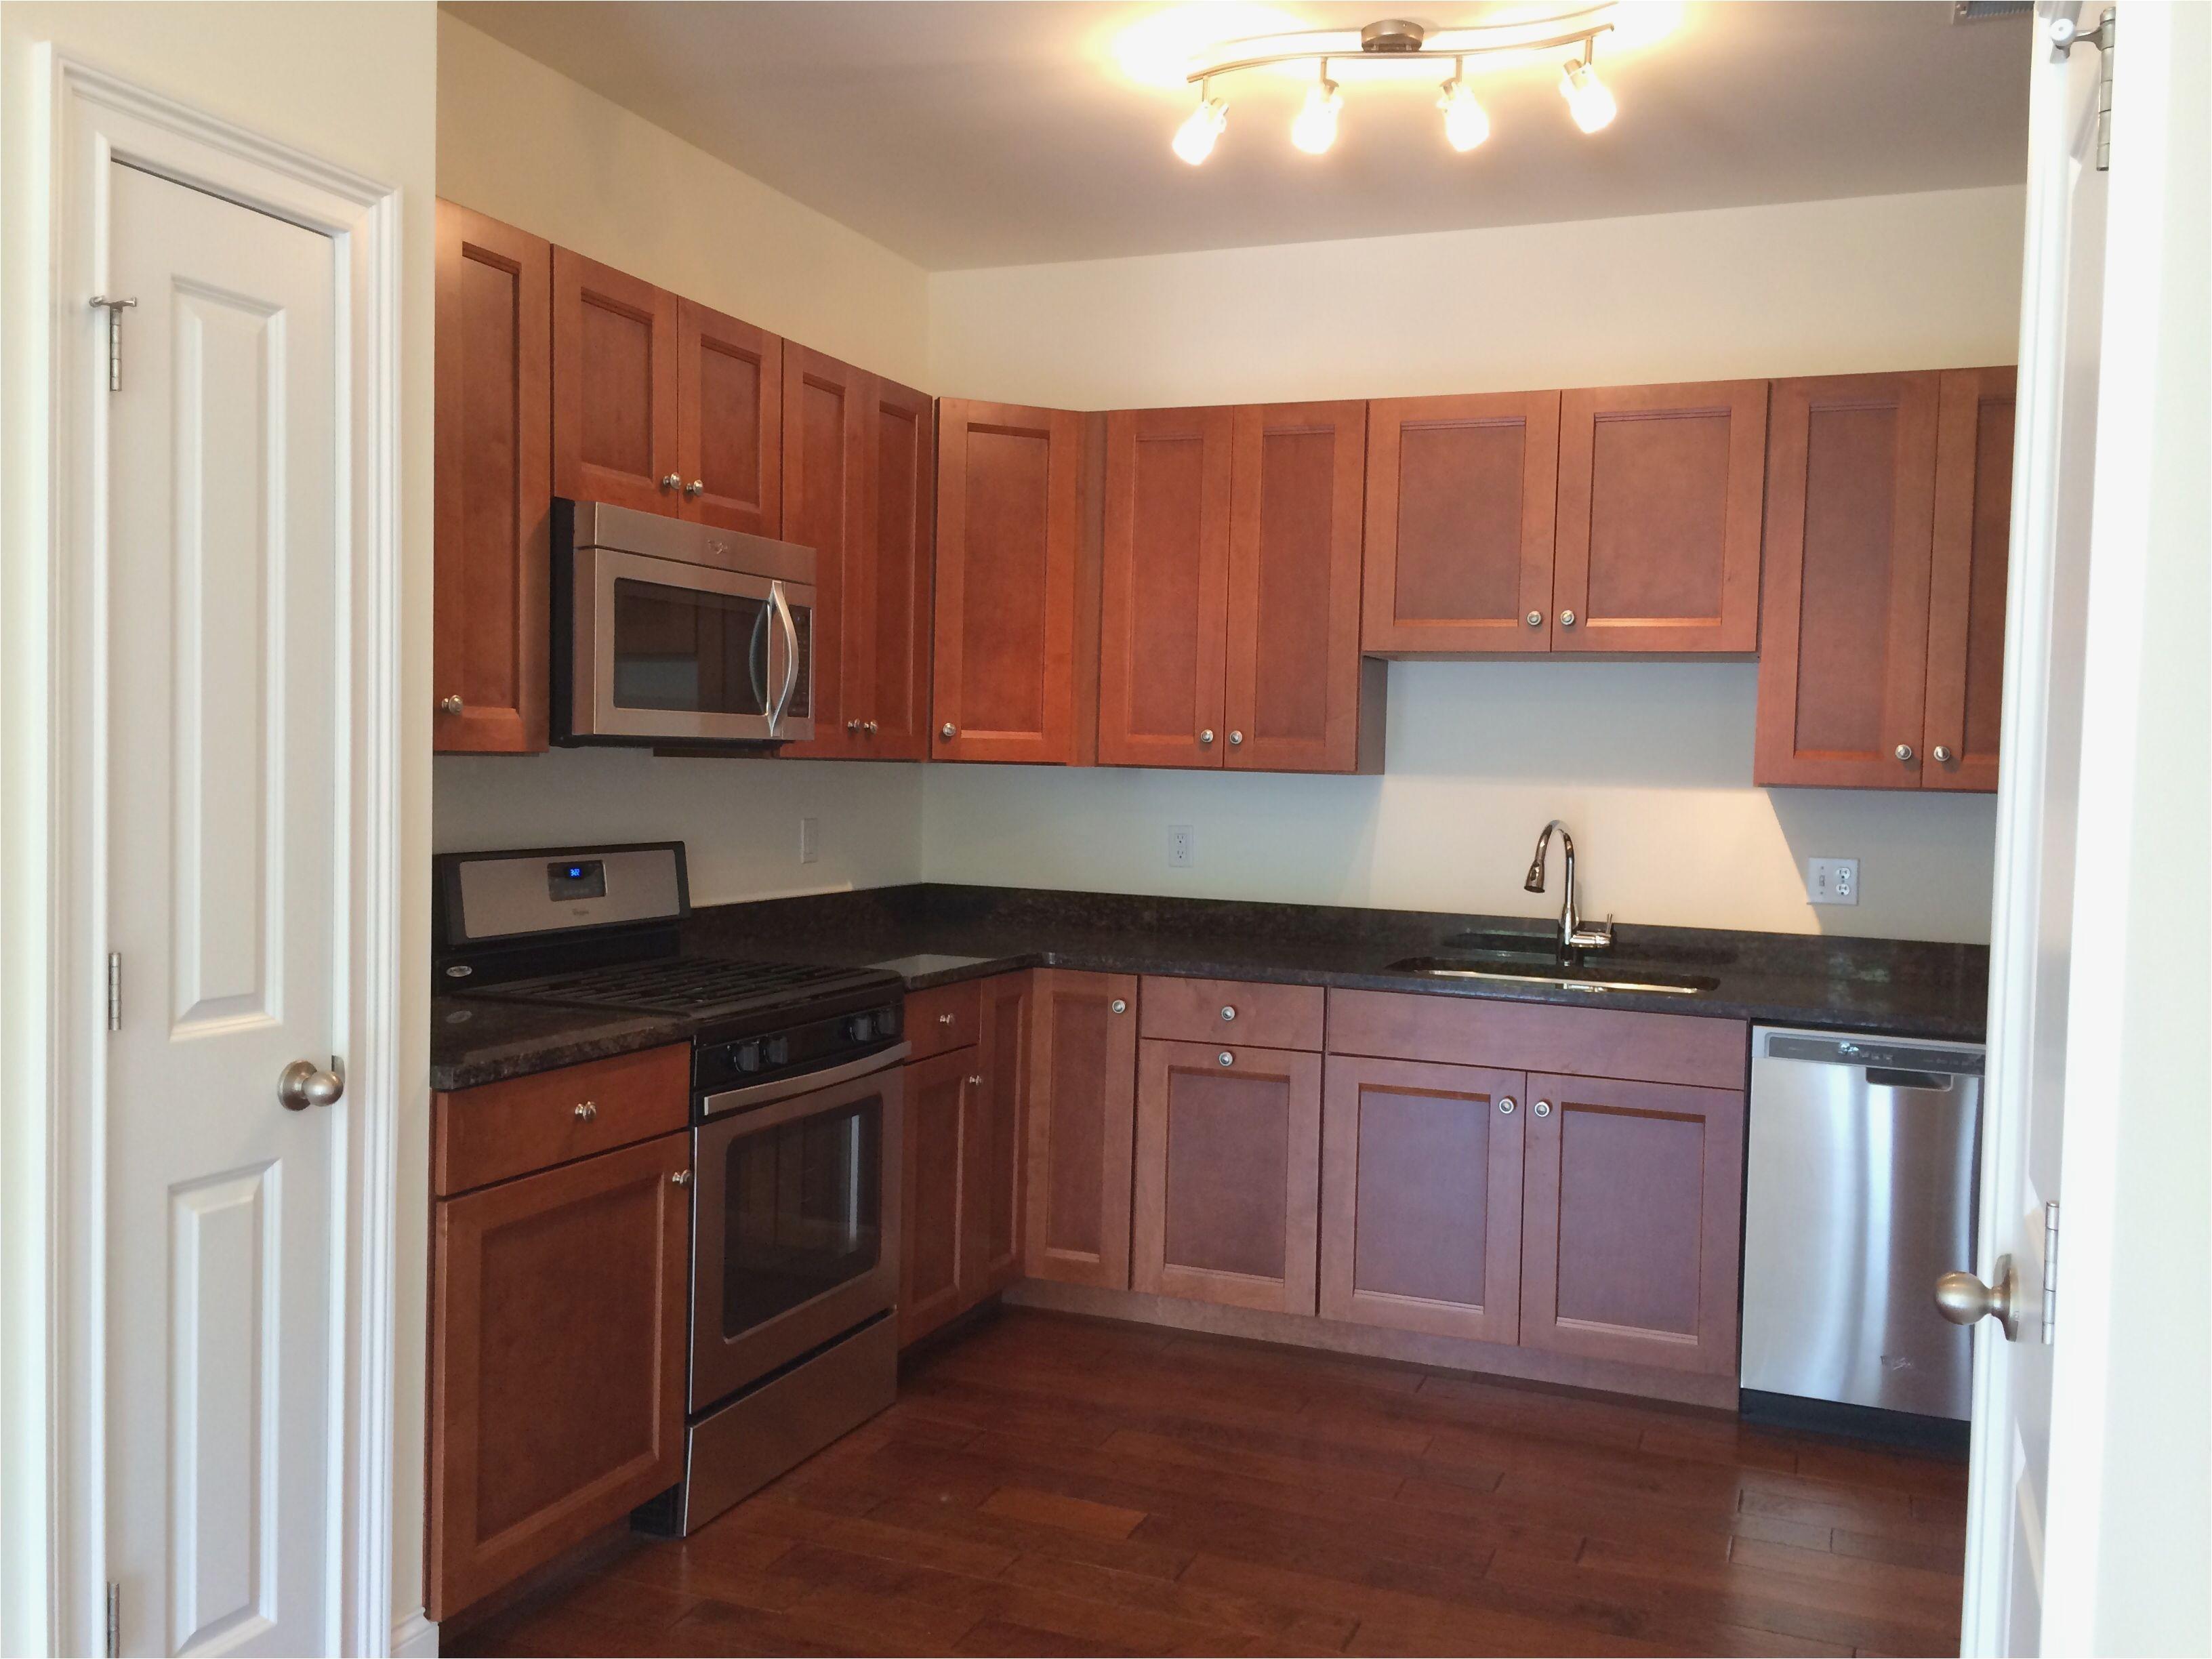 Who Makes Hampton Bay Kitchen Cabinets who Makes Hampton Bay Cabinets Gammoe Com